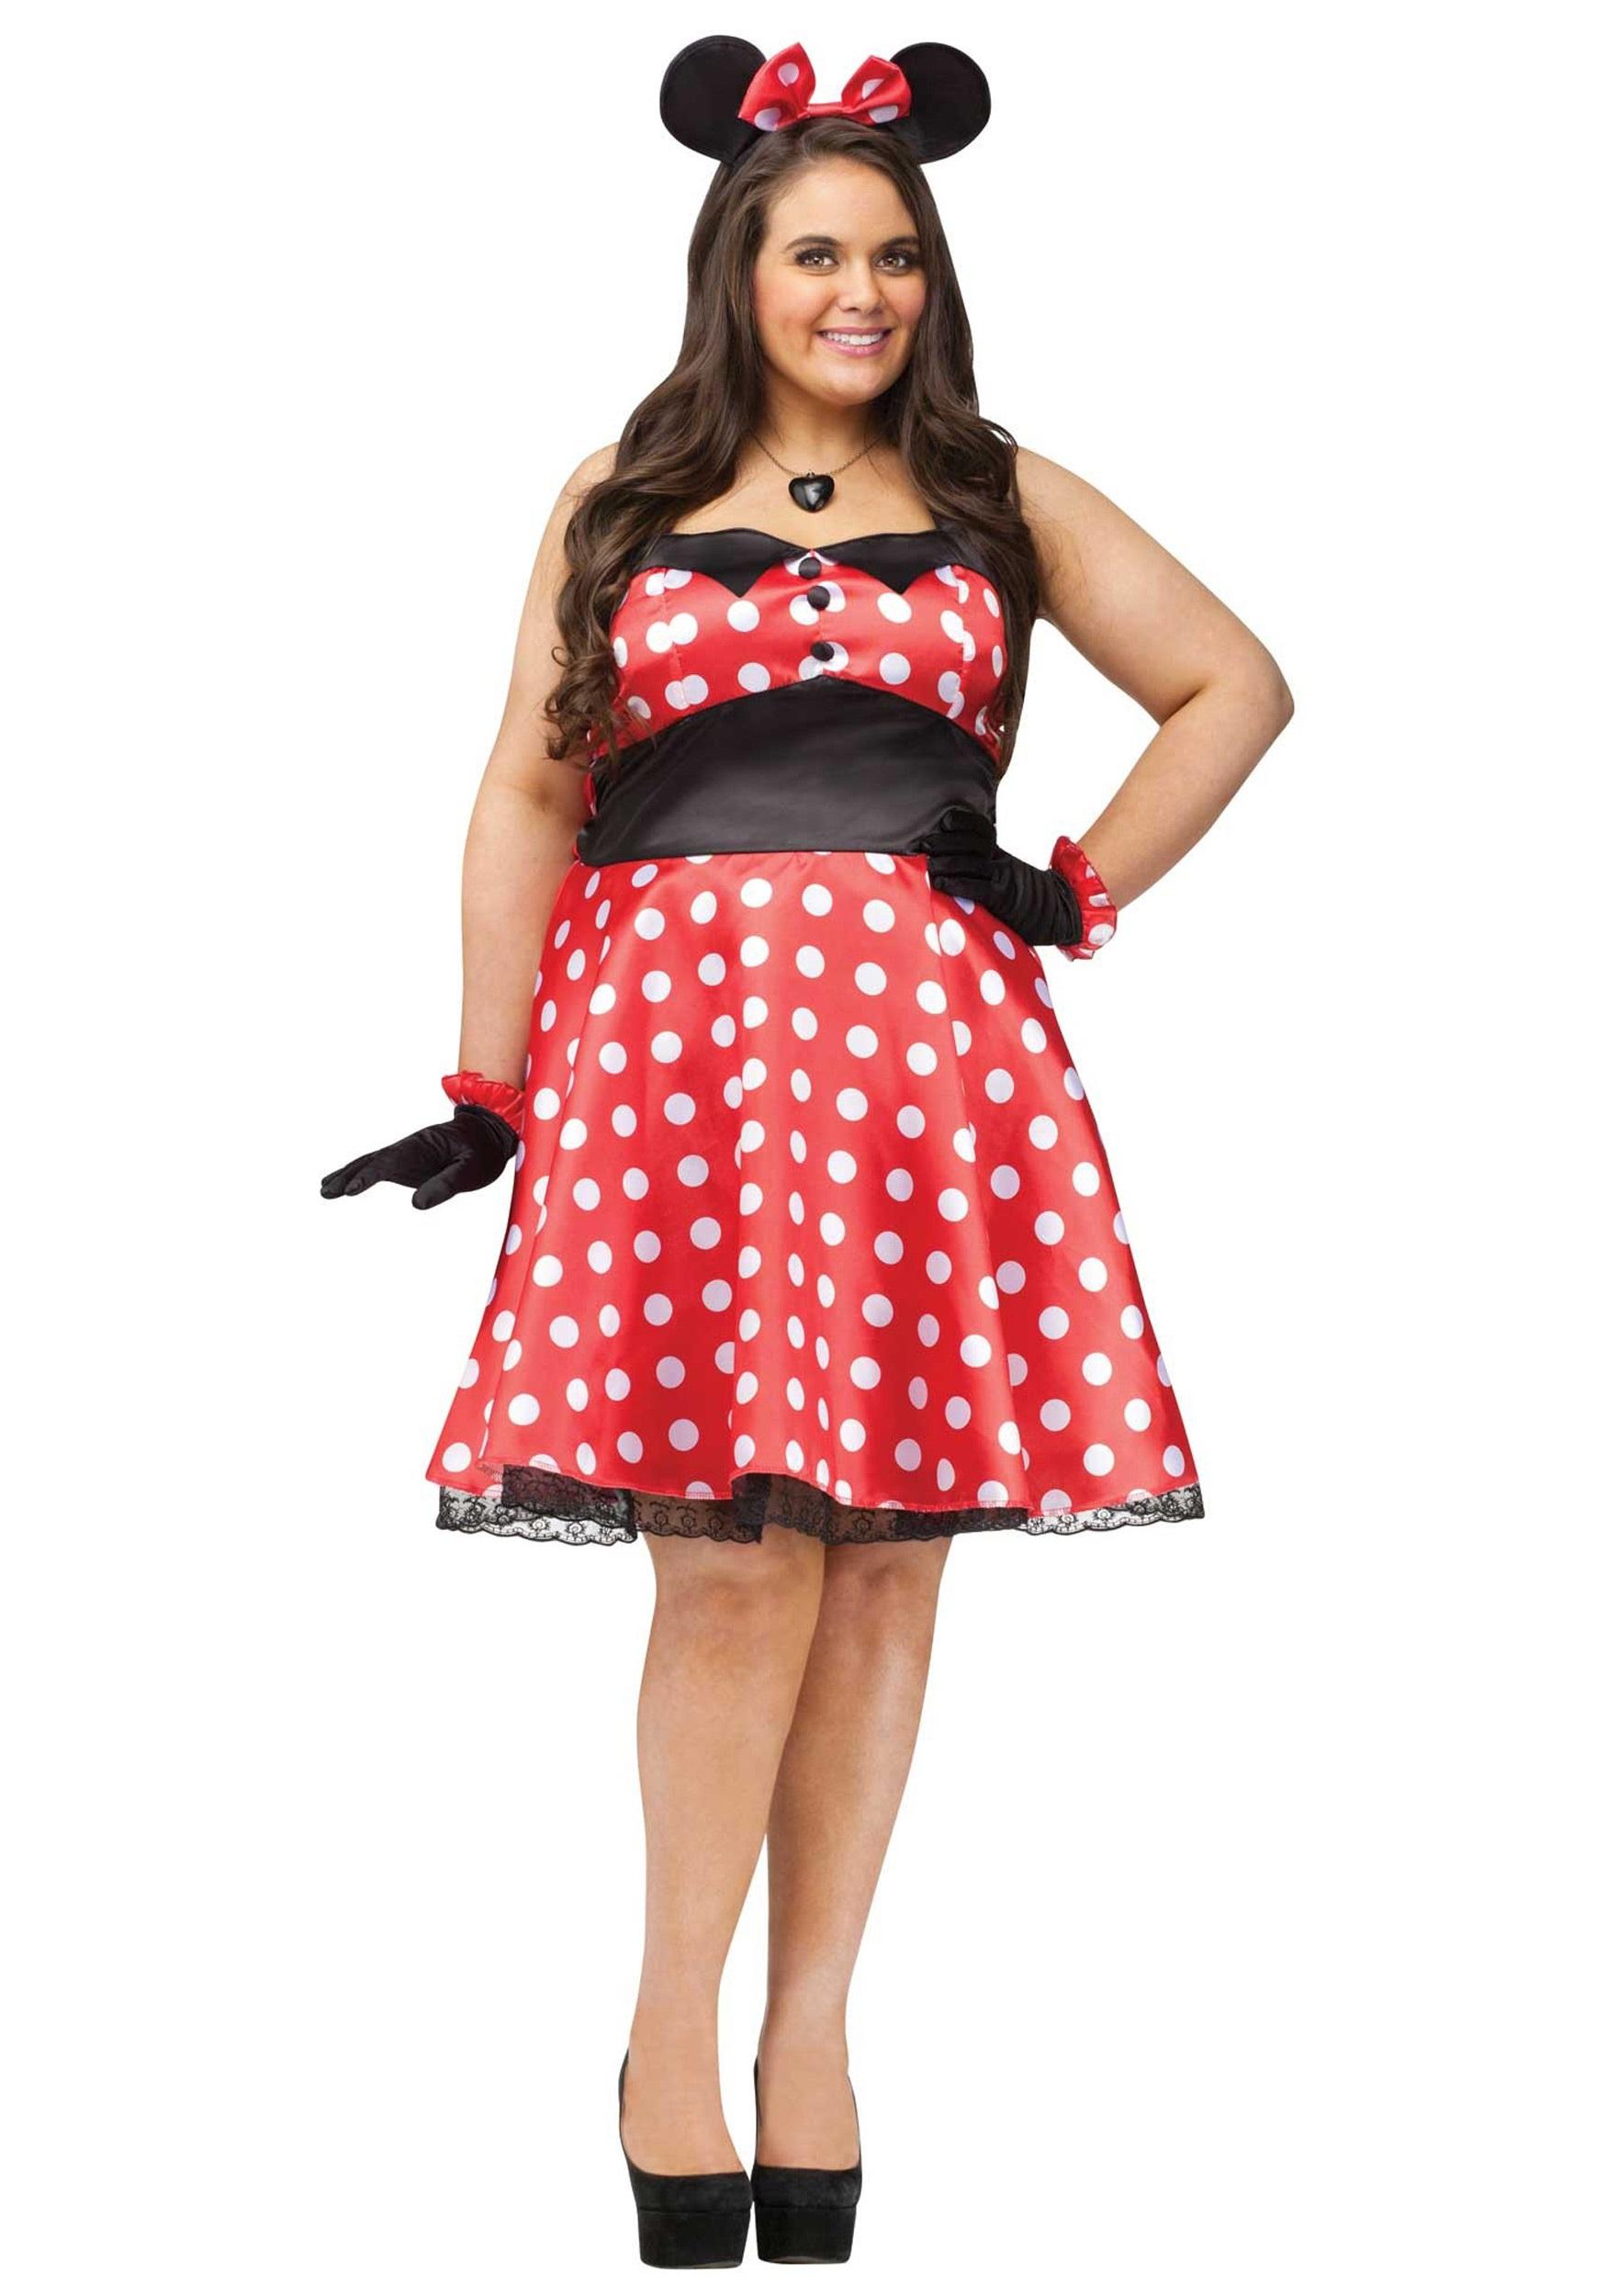 Miss Mouse Costume Halloween Fancy Dress